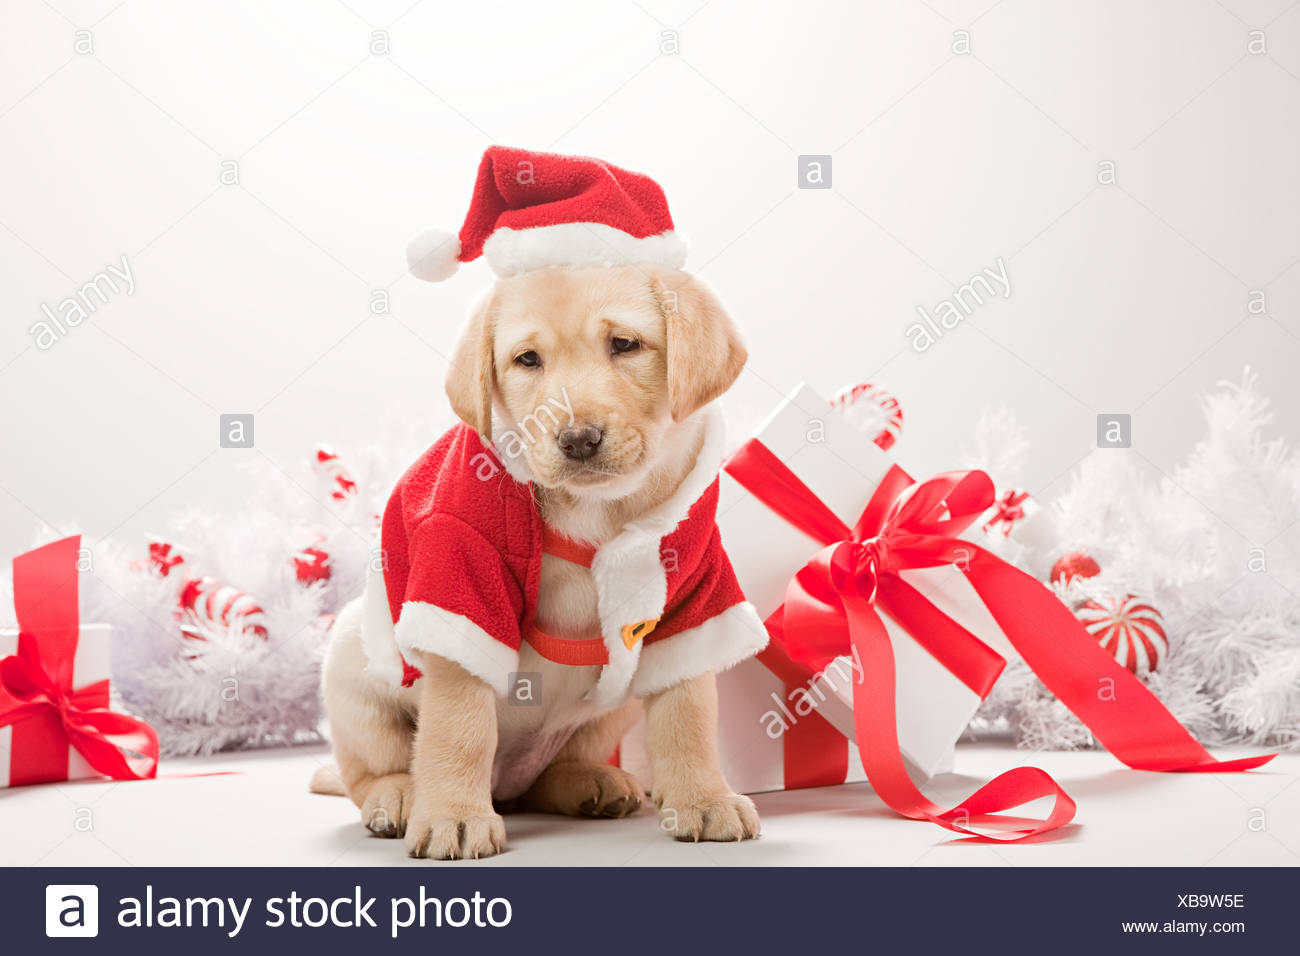 Labrador Puppy In Christmas Costume Stock Photo Alamy